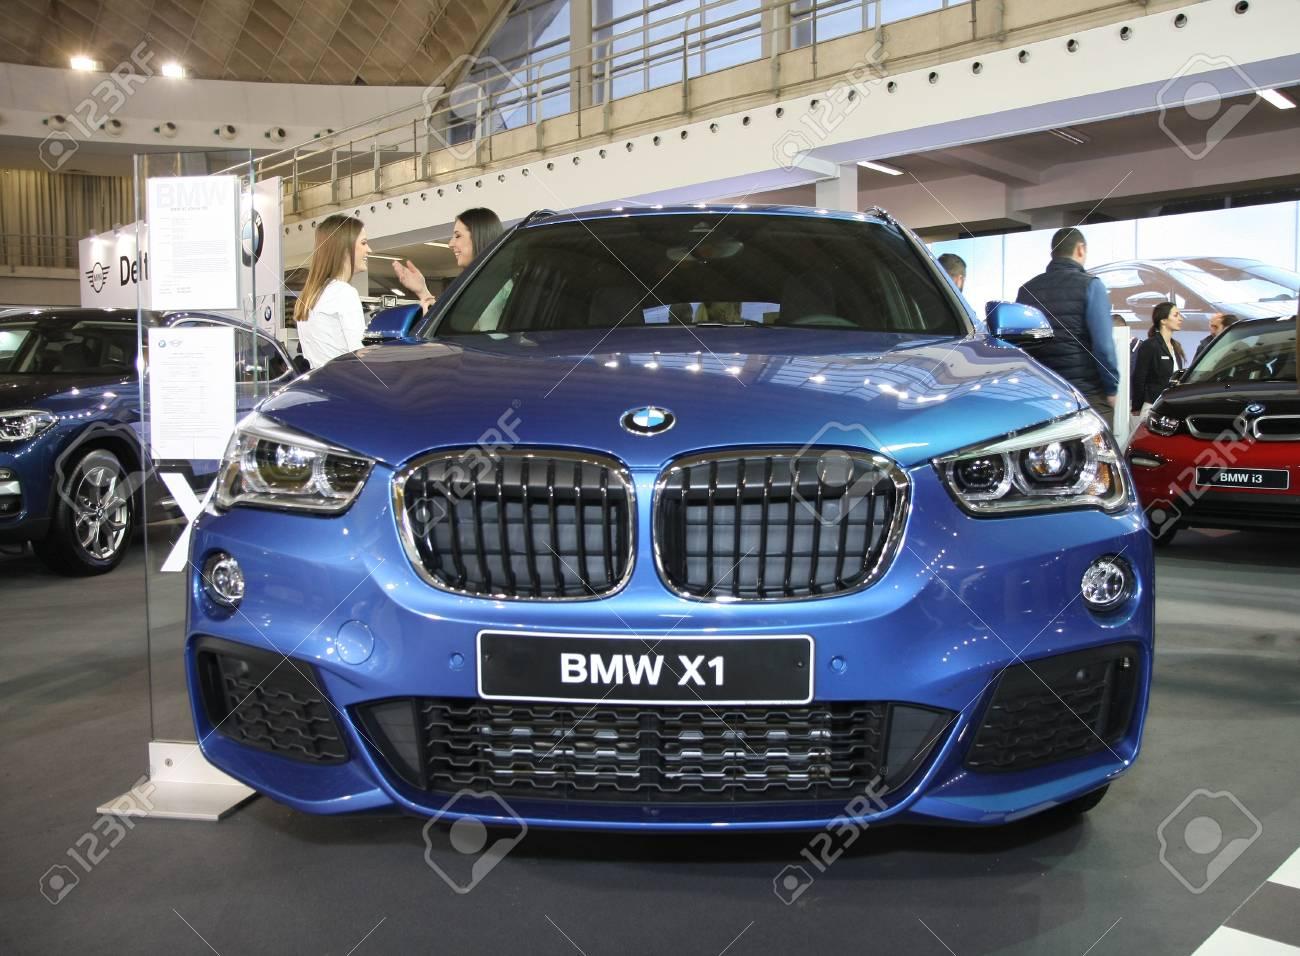 Belgrade Serbia March 27 2018 Bmw X1 Sdrive 18d At Ddor Bg Stock